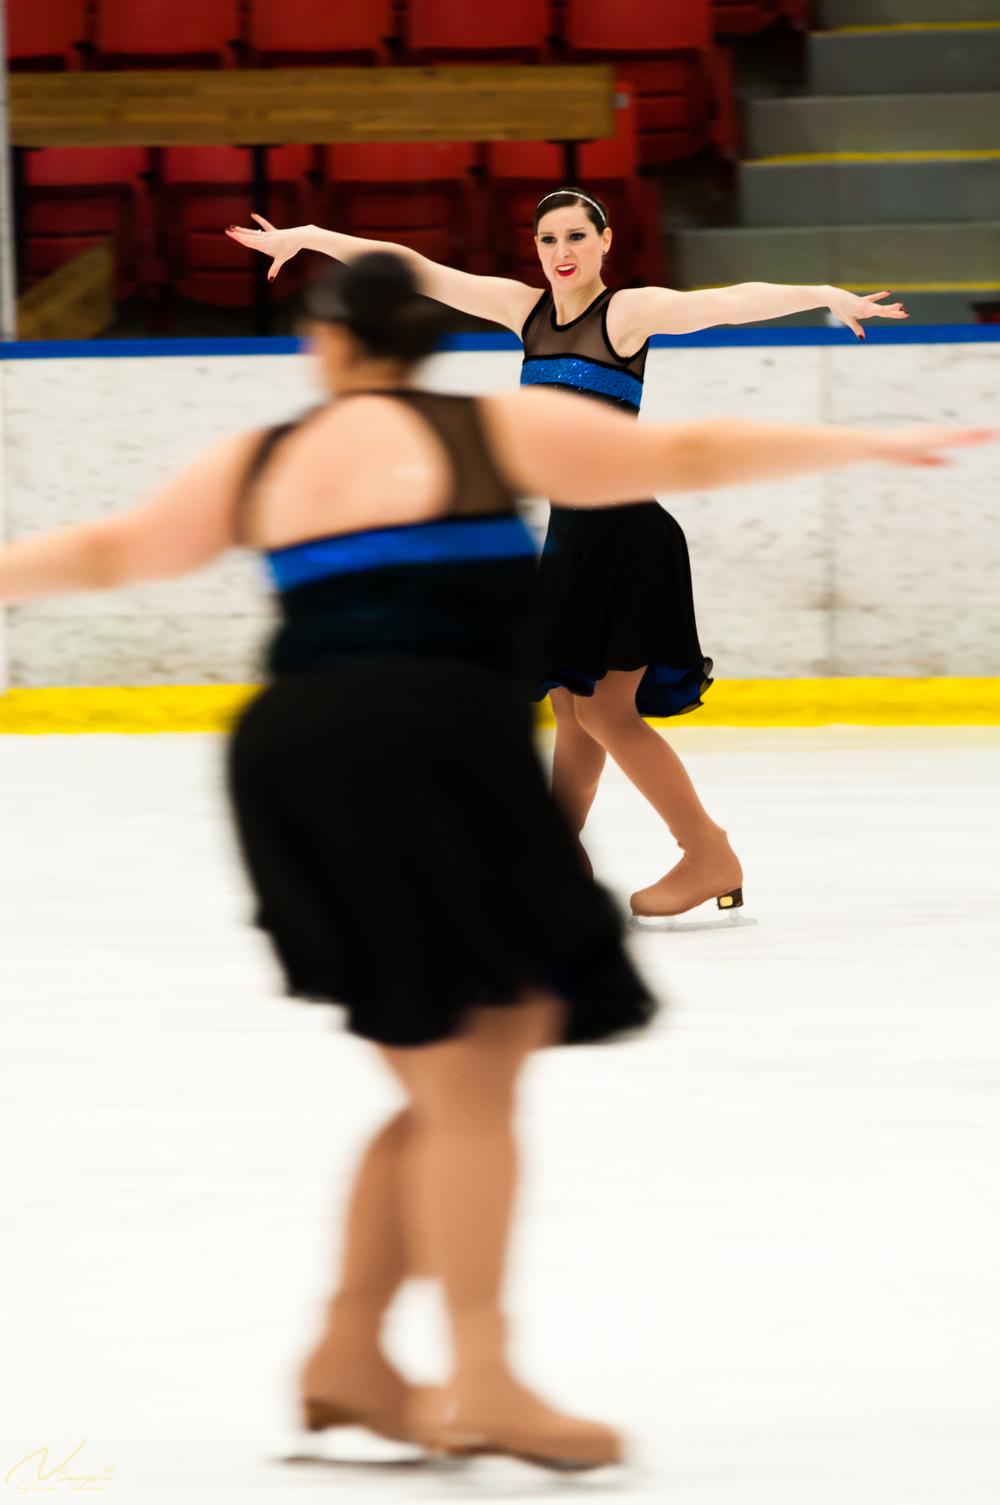 Sher Khan Niazi-Skating-1234.jpg